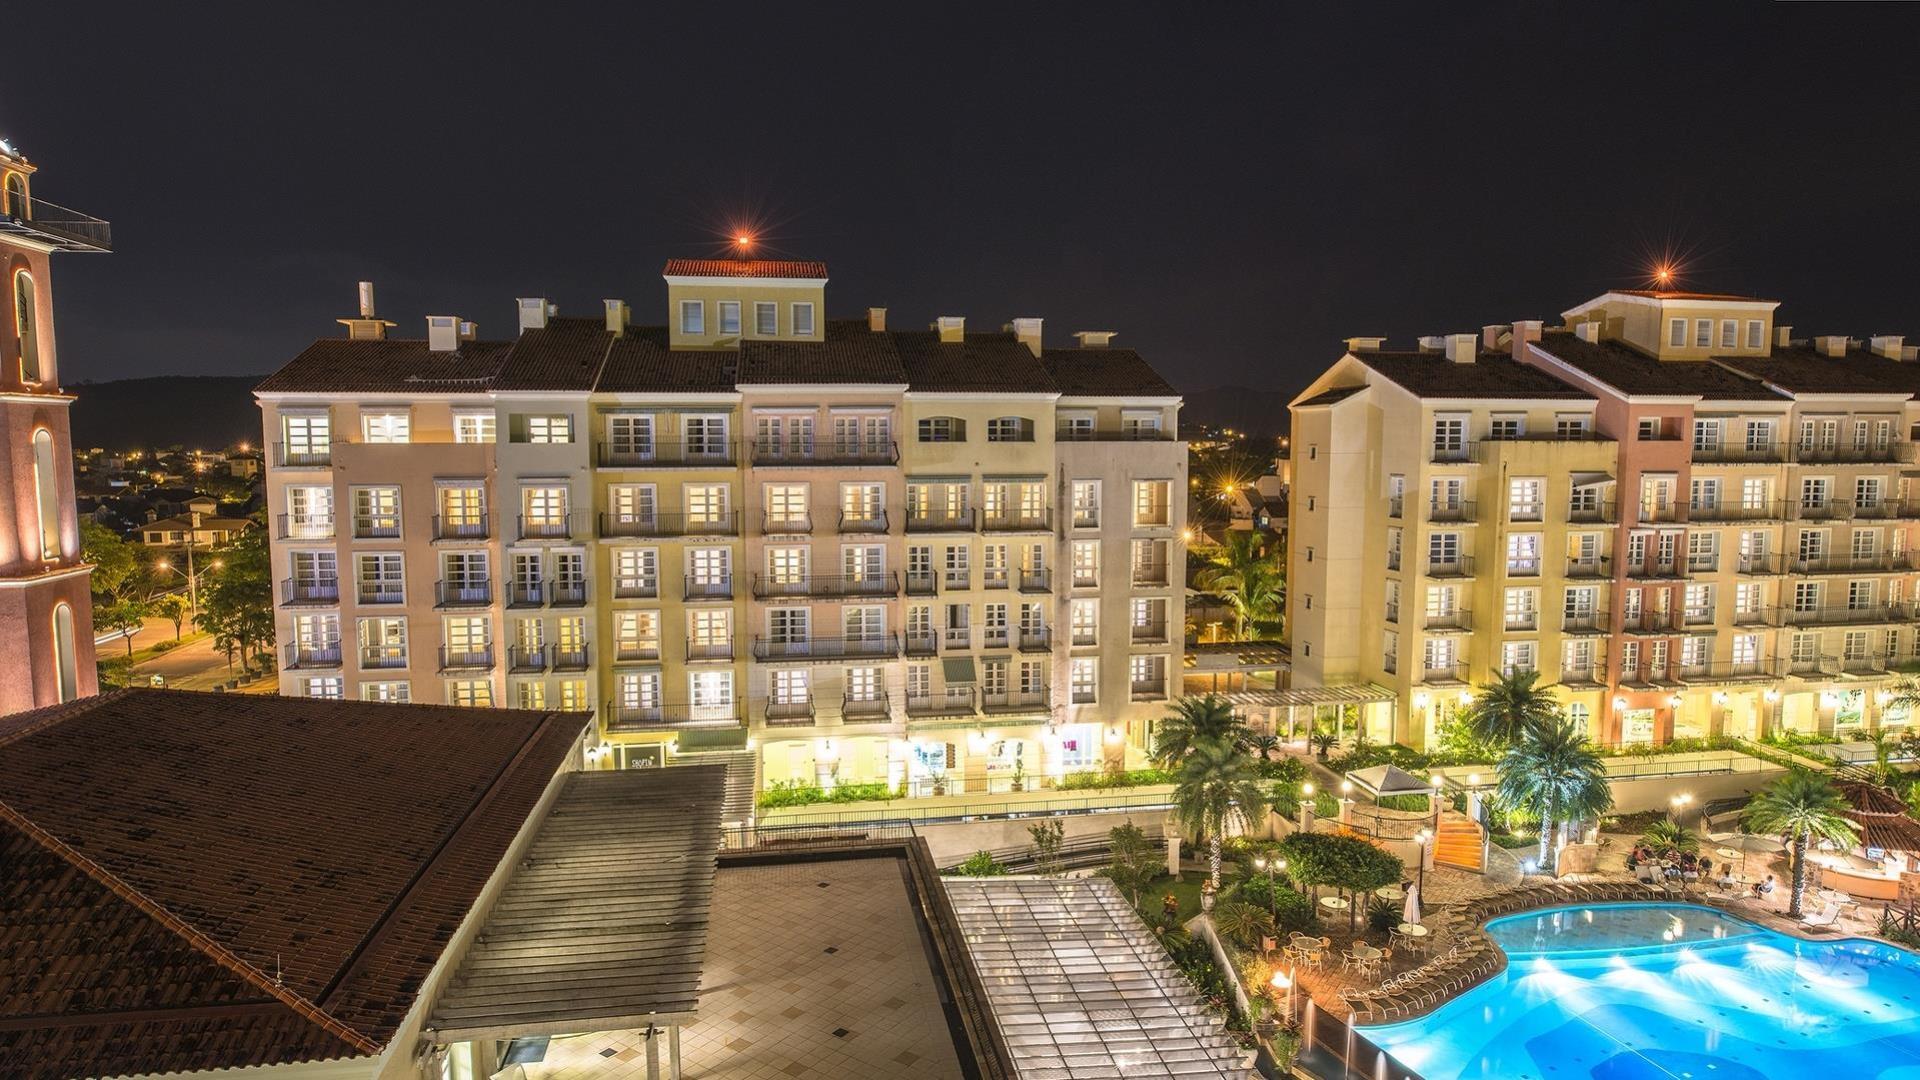 Brasilien Florianopolis: Deluxe Hotel - Jurere IL Campanario Villaggio Resort